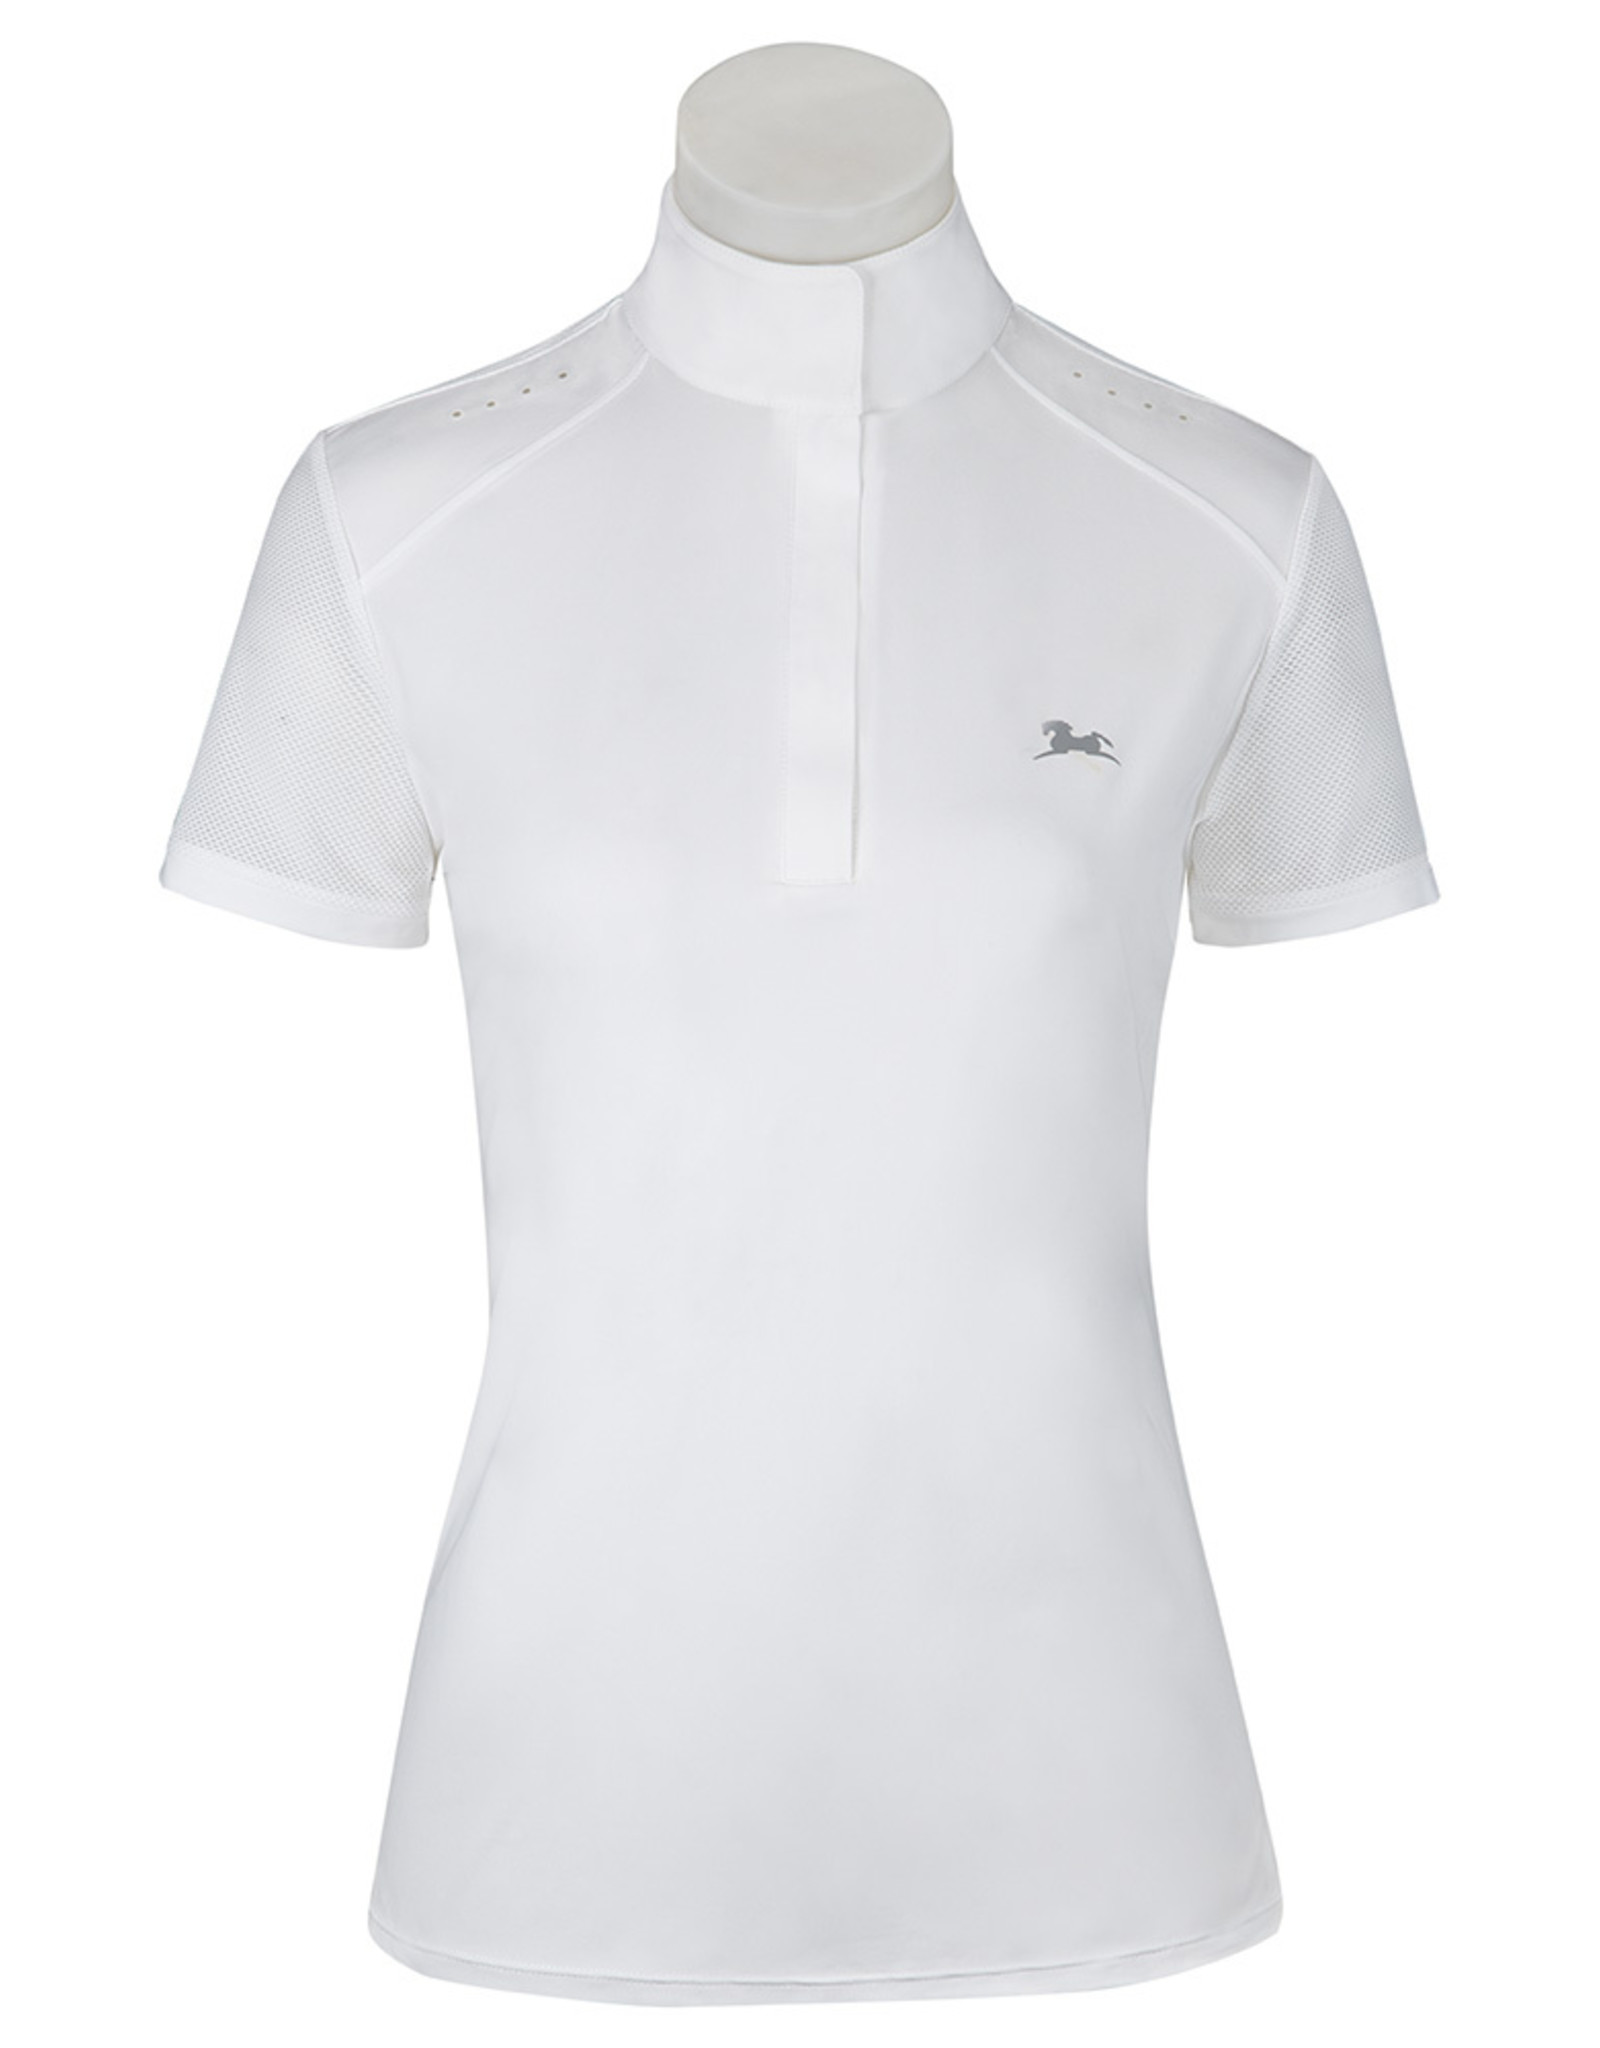 RJ Classic Ladies' Aerial Short Sleve Show Shirt